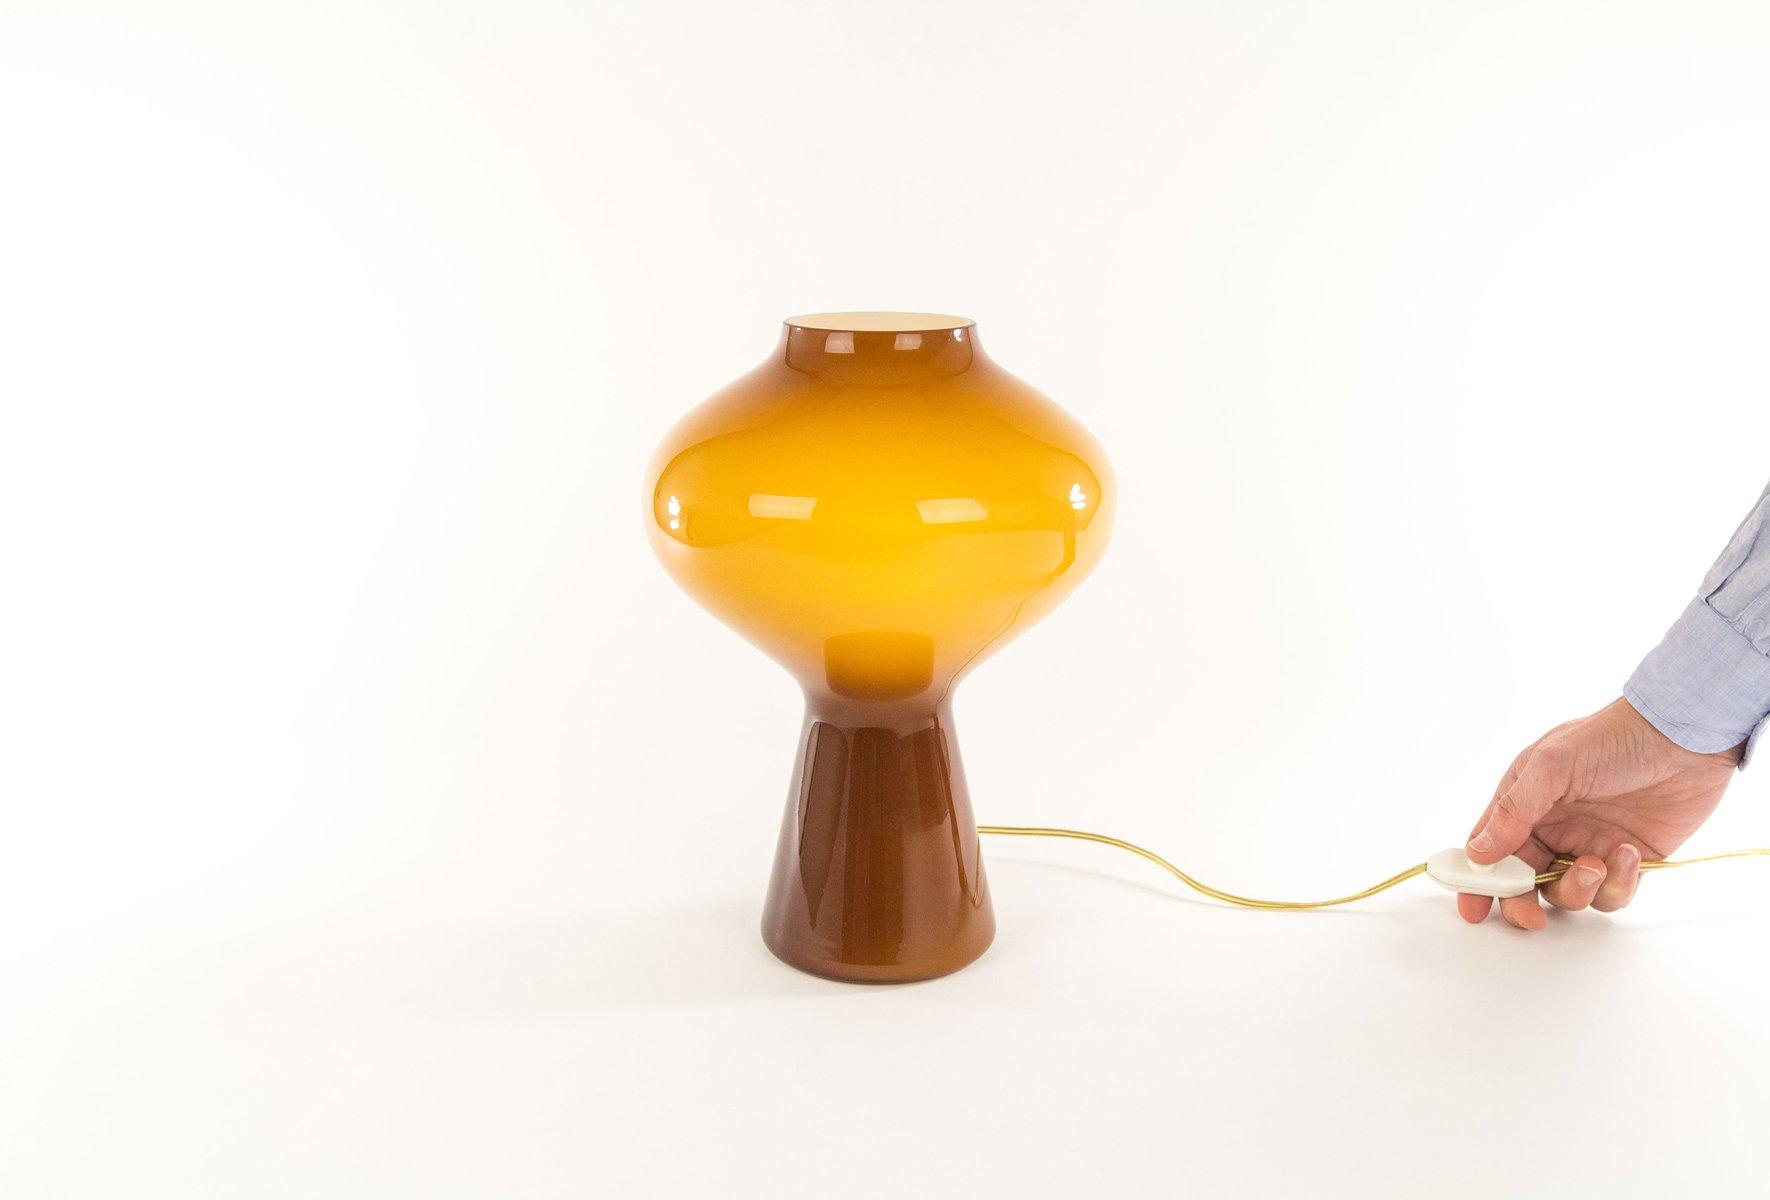 Grande Lampe de Bureau Fungo en Verre Souffl  la Main par Massimo Vignelli pour Venini 1960s